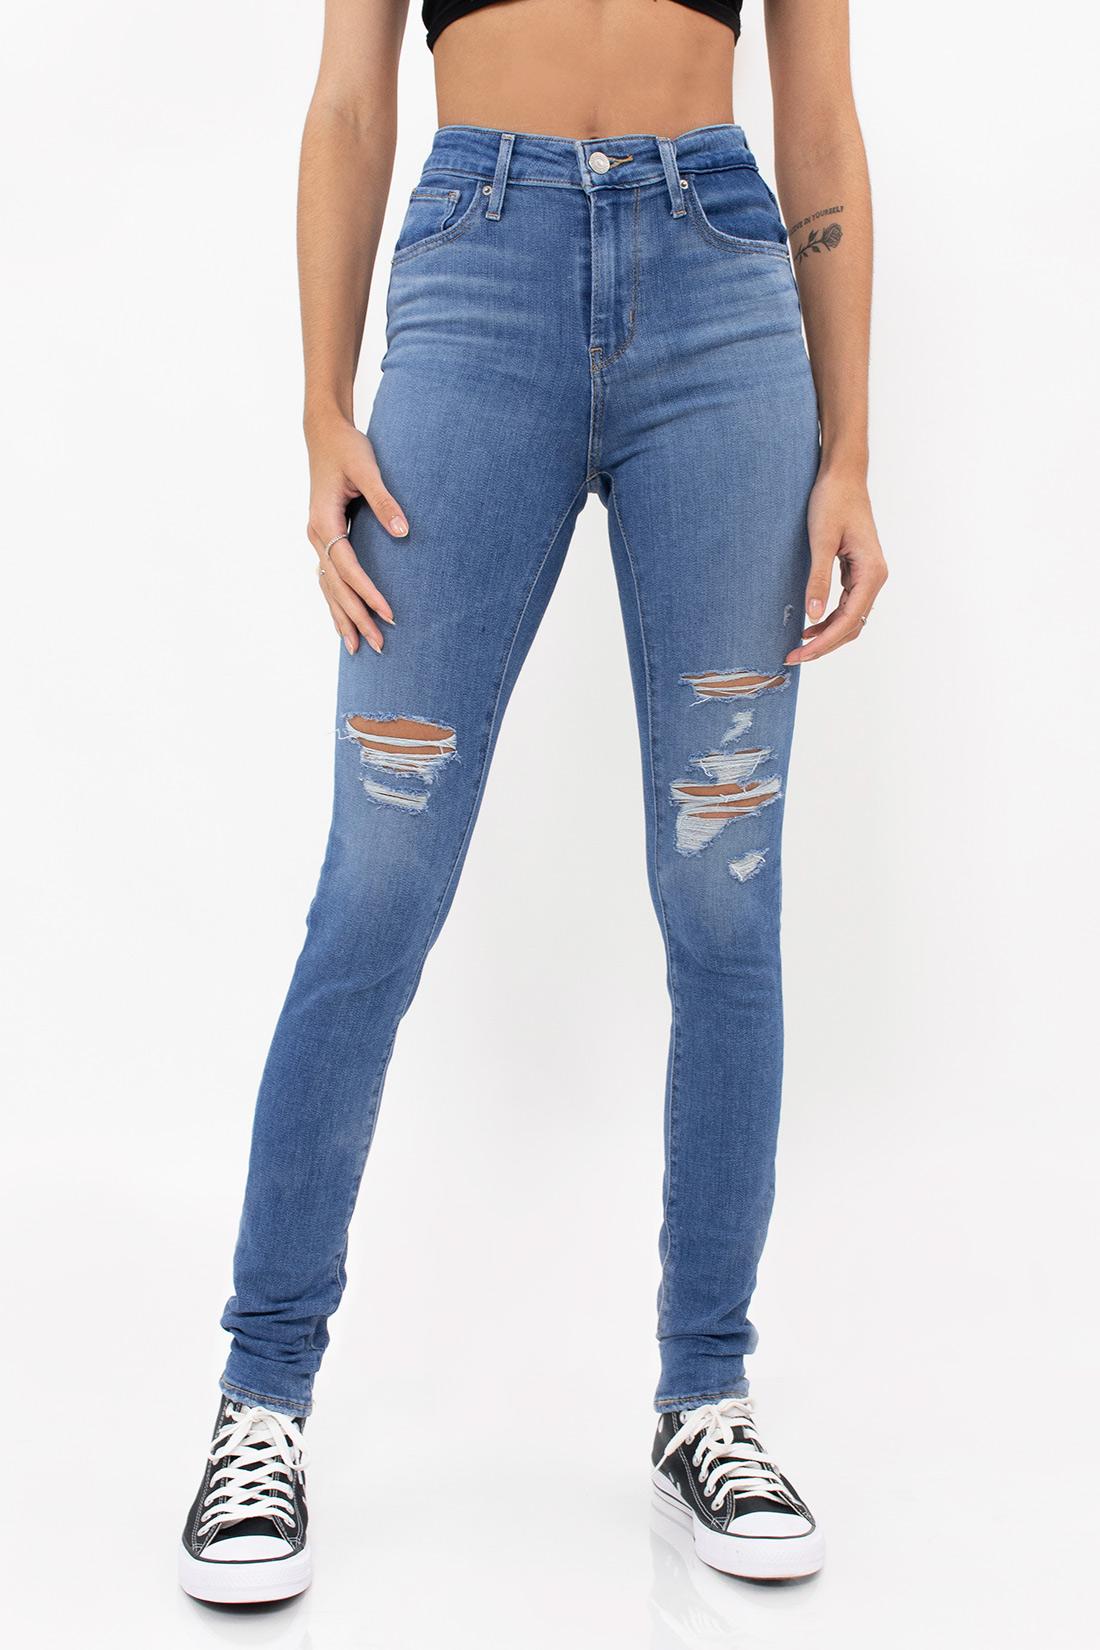 Calca Jeans Levis 721 High Rise Skinny Rasgos